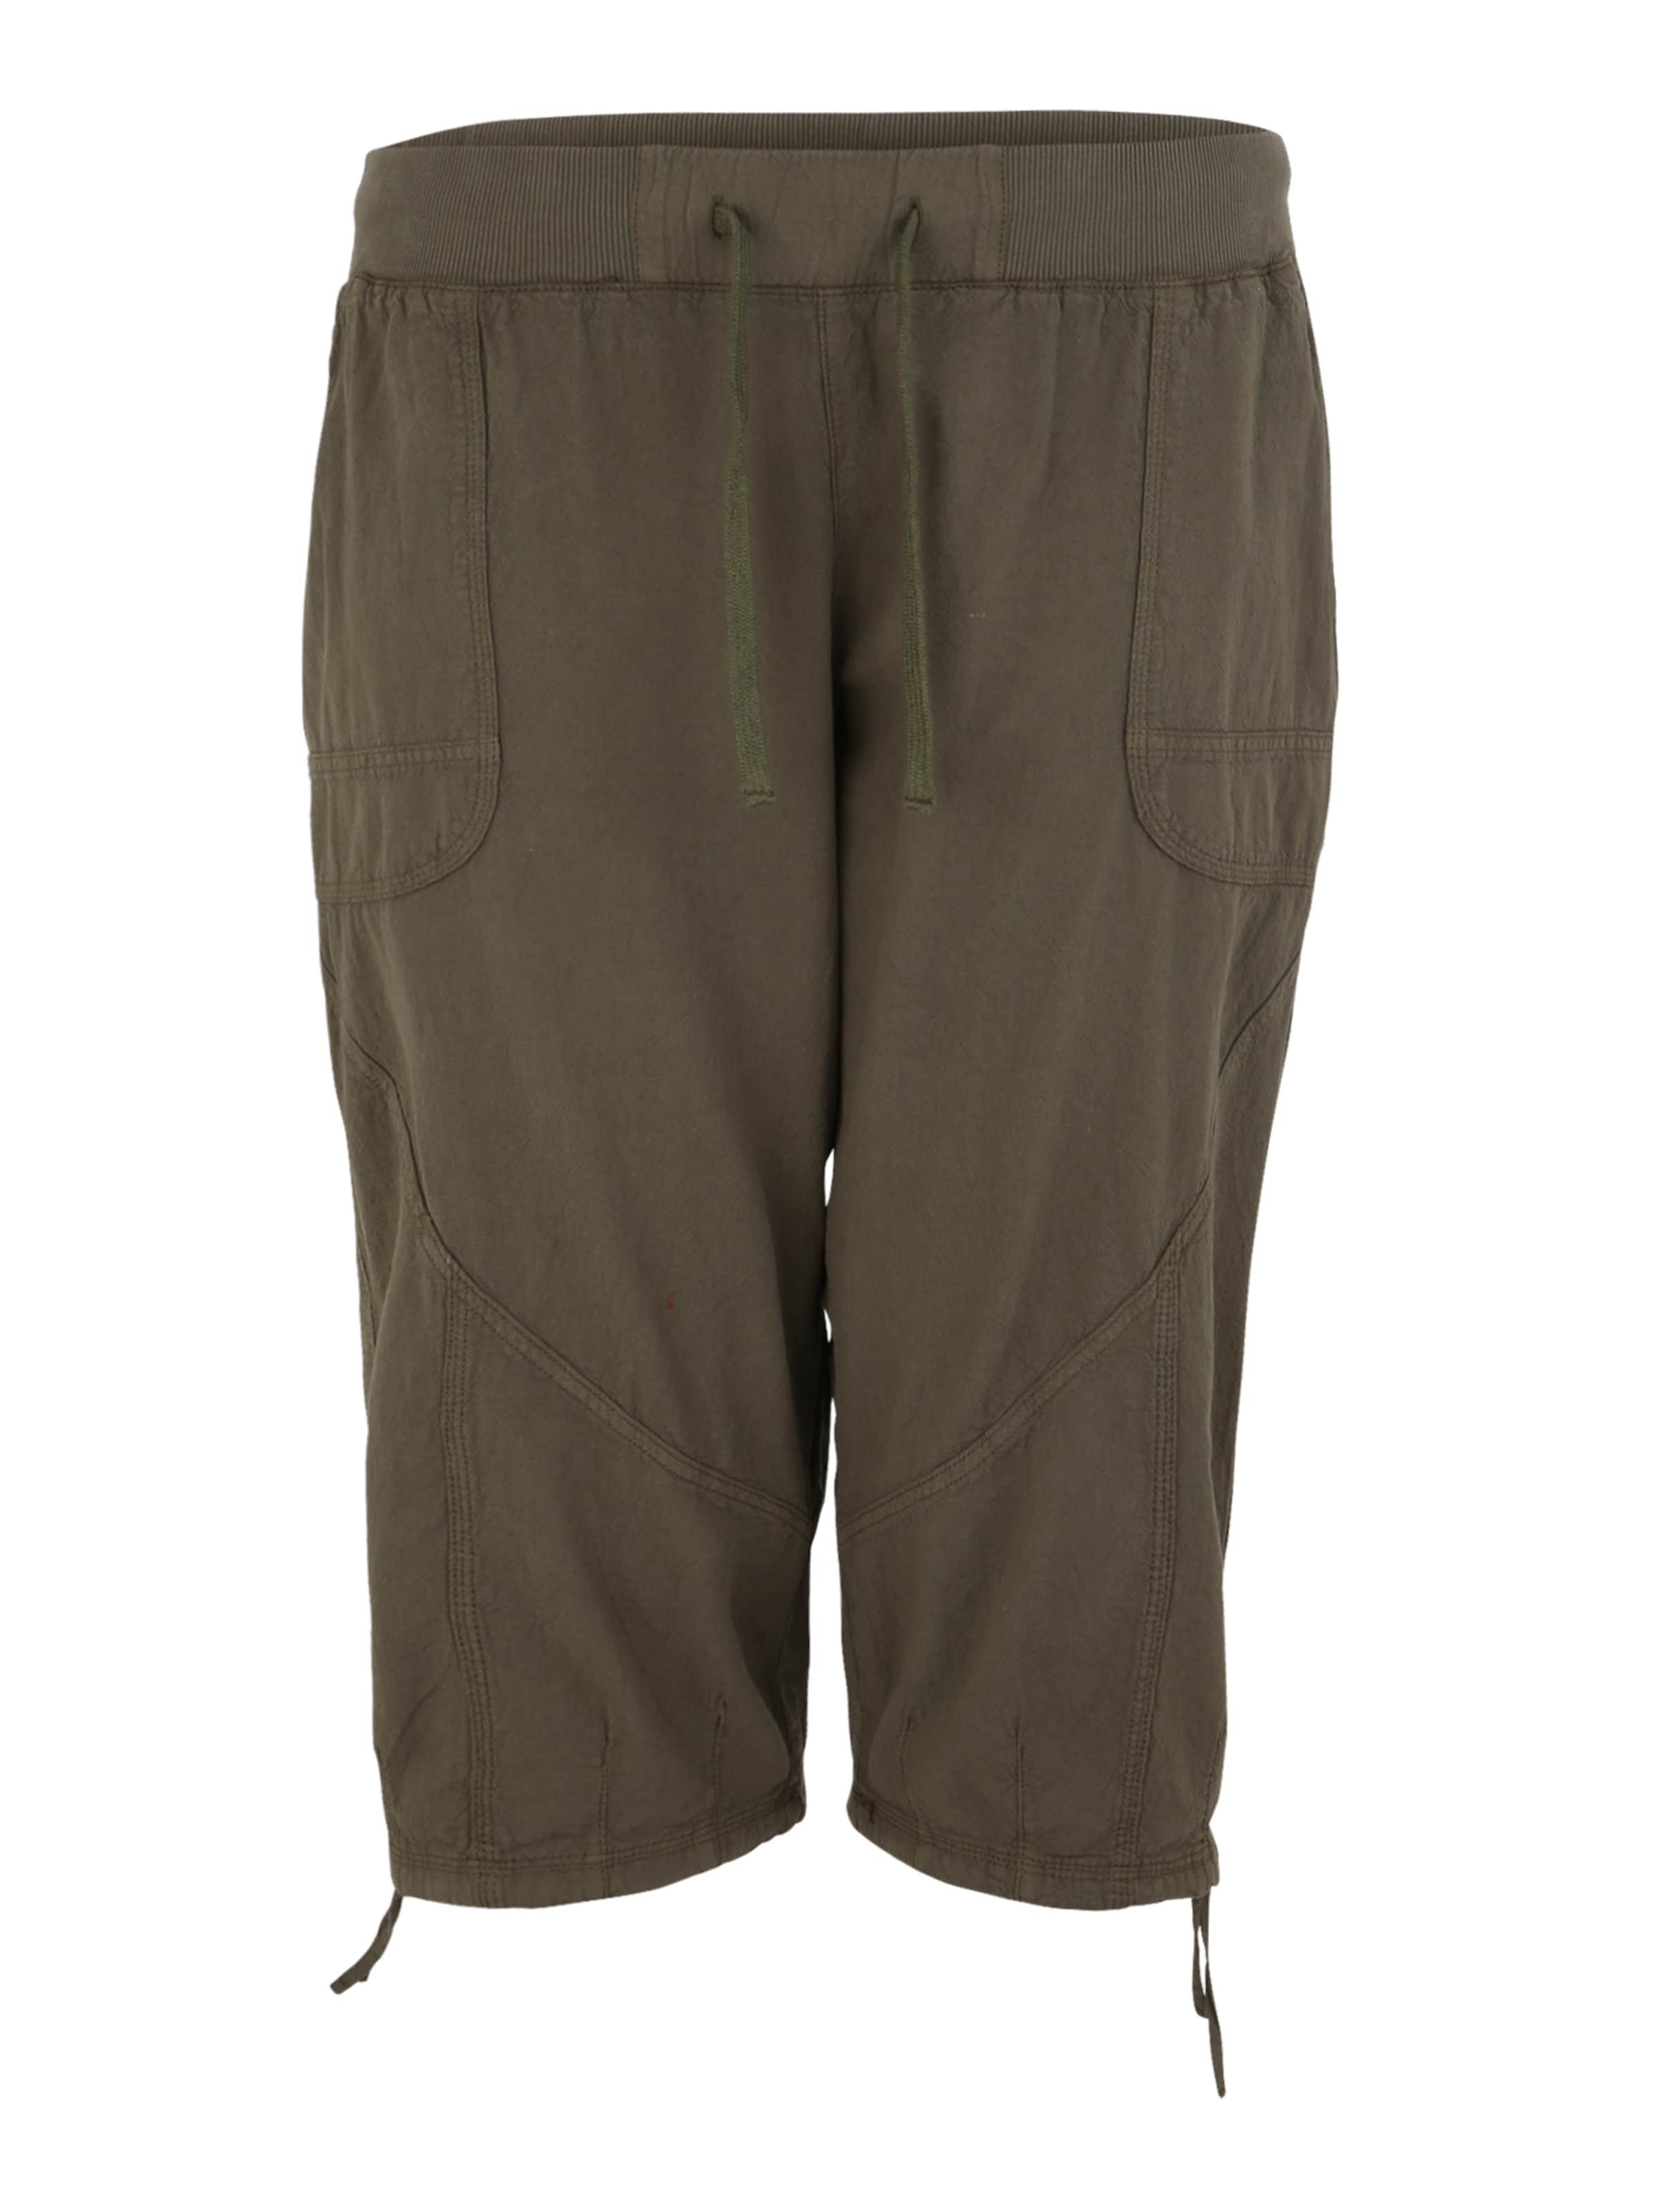 Pantalon 'mmarakesh' En 'mmarakesh' Zizzi Pantalon Zizzi Zizzi 'mmarakesh' Olive Pantalon En Olive En R5jLA4